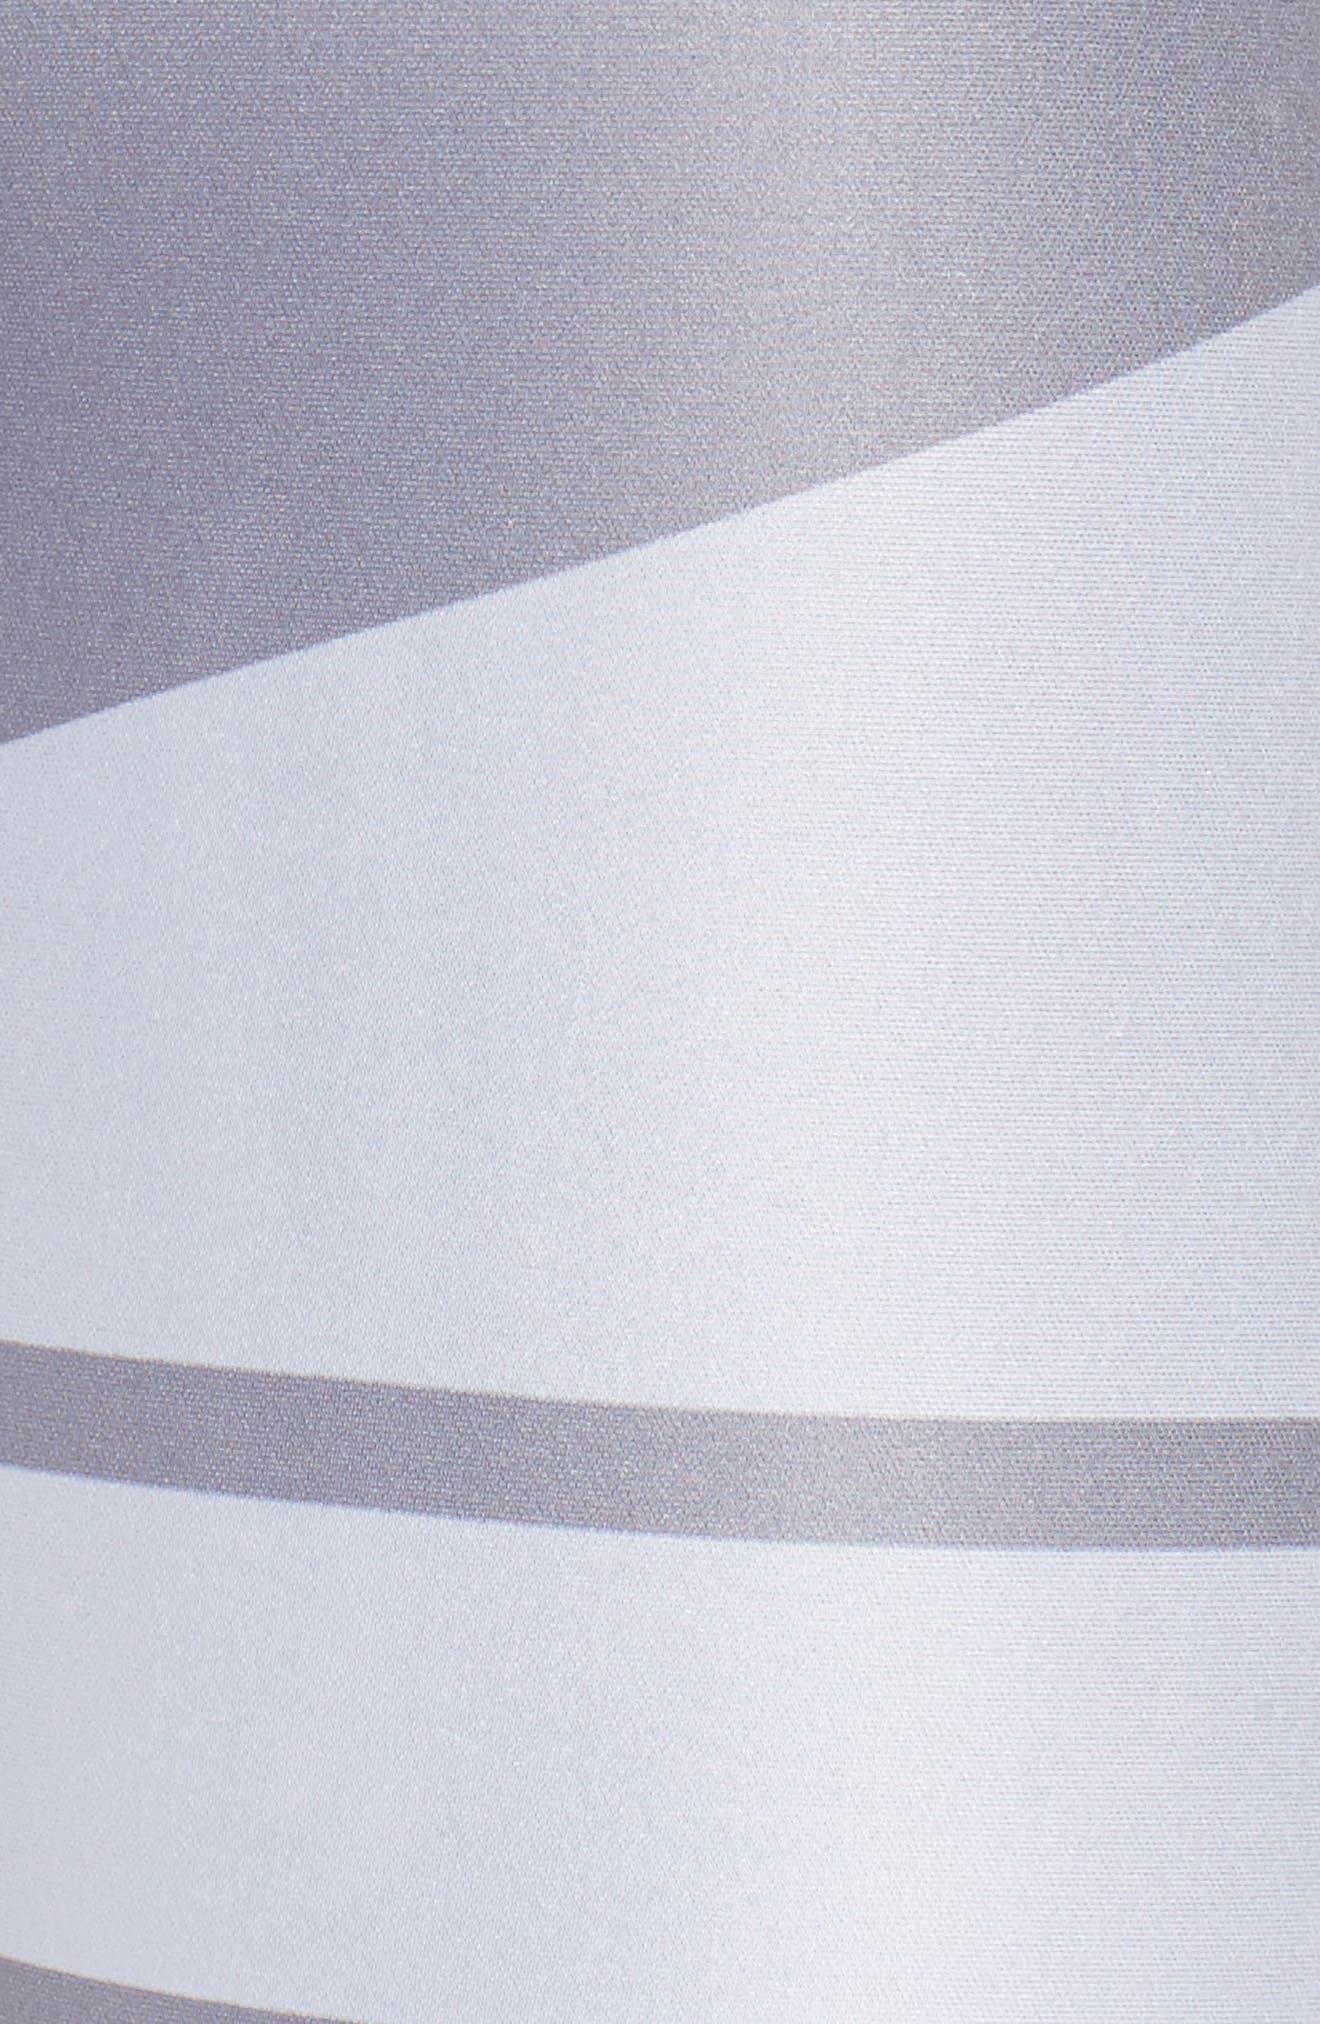 Tech Lift Airbrush Leggings,                             Alternate thumbnail 23, color,